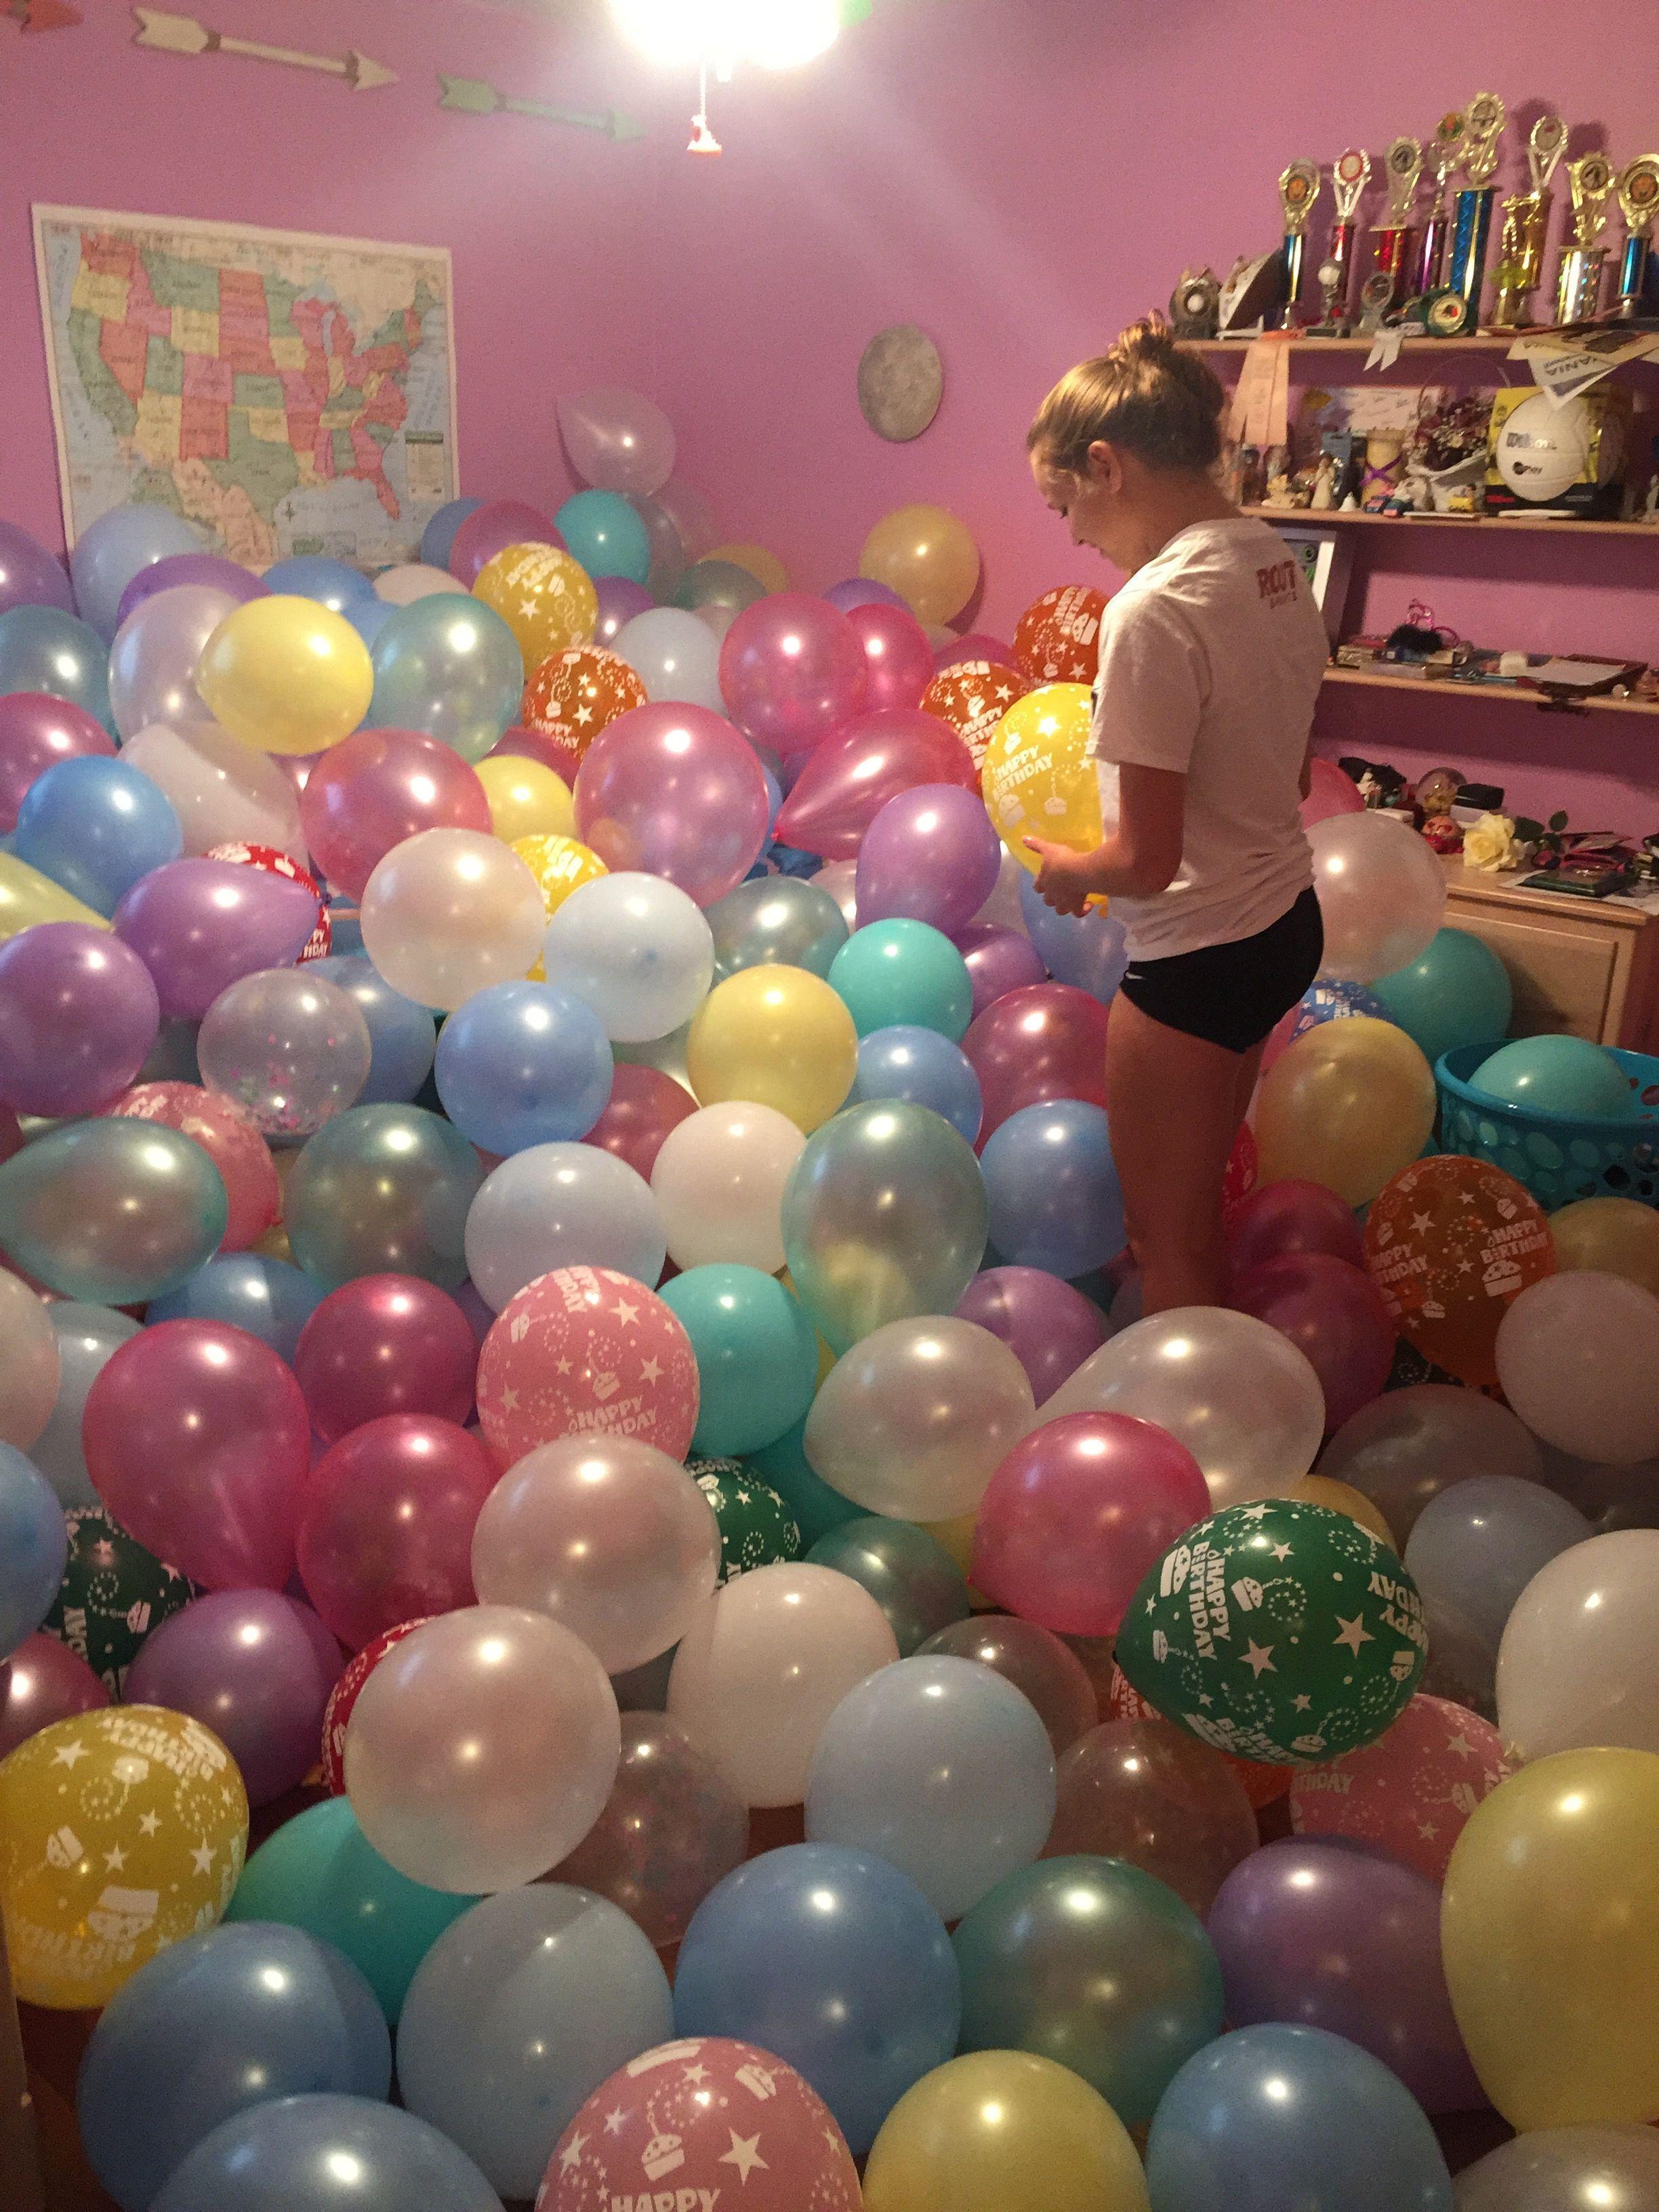 where to take boyfriend for 21st birthday